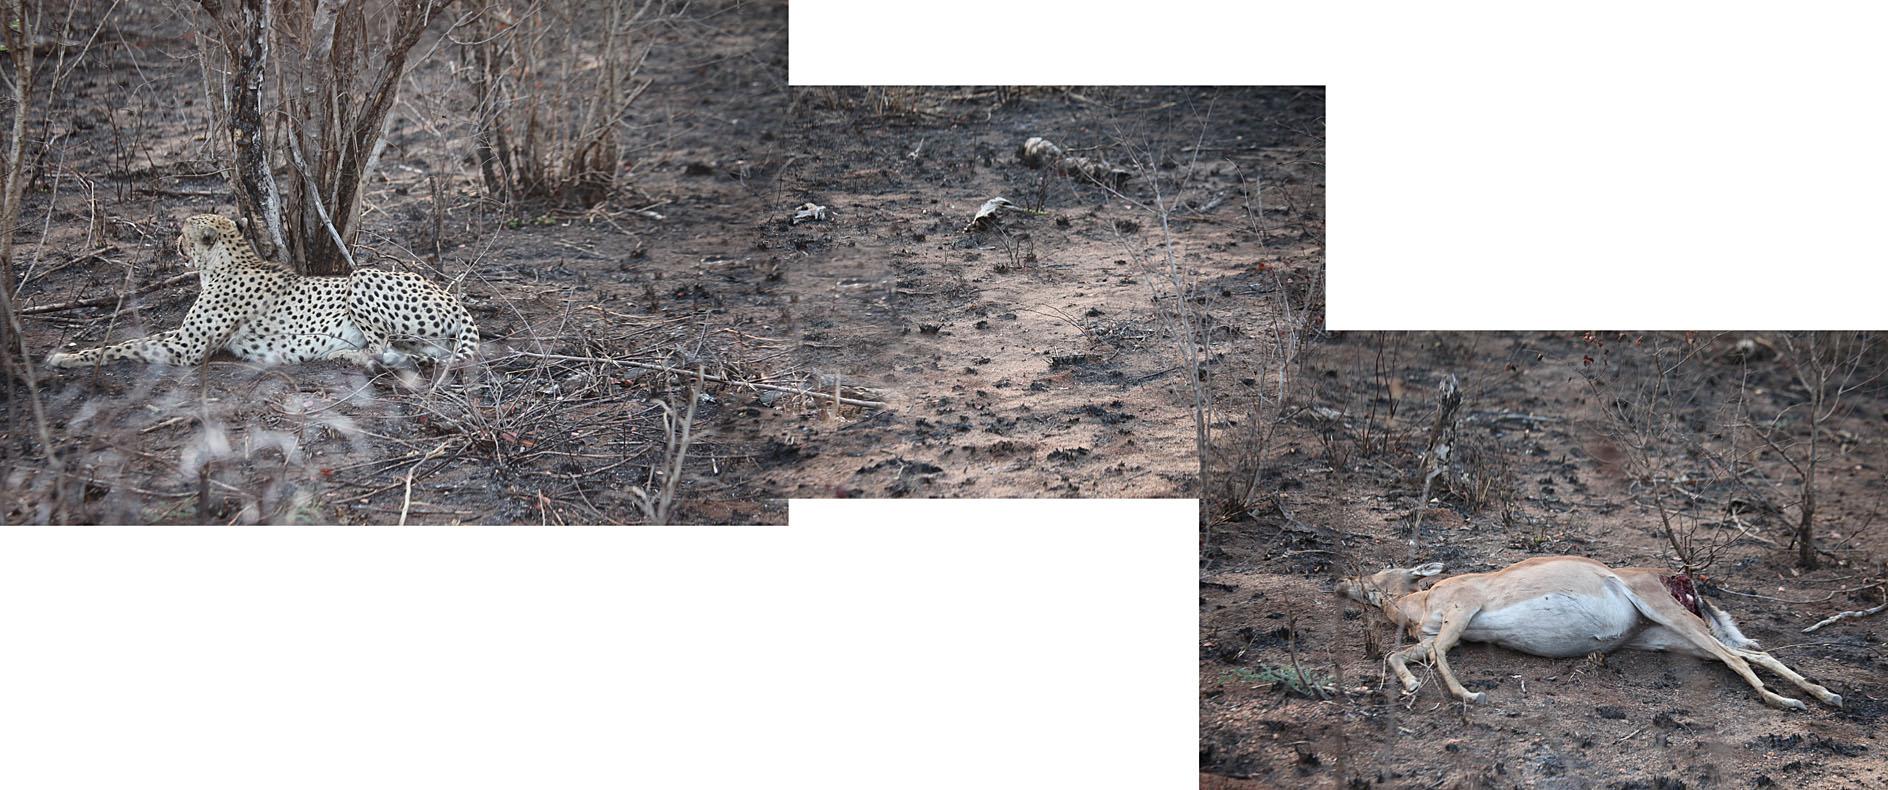 Cheetah and prey